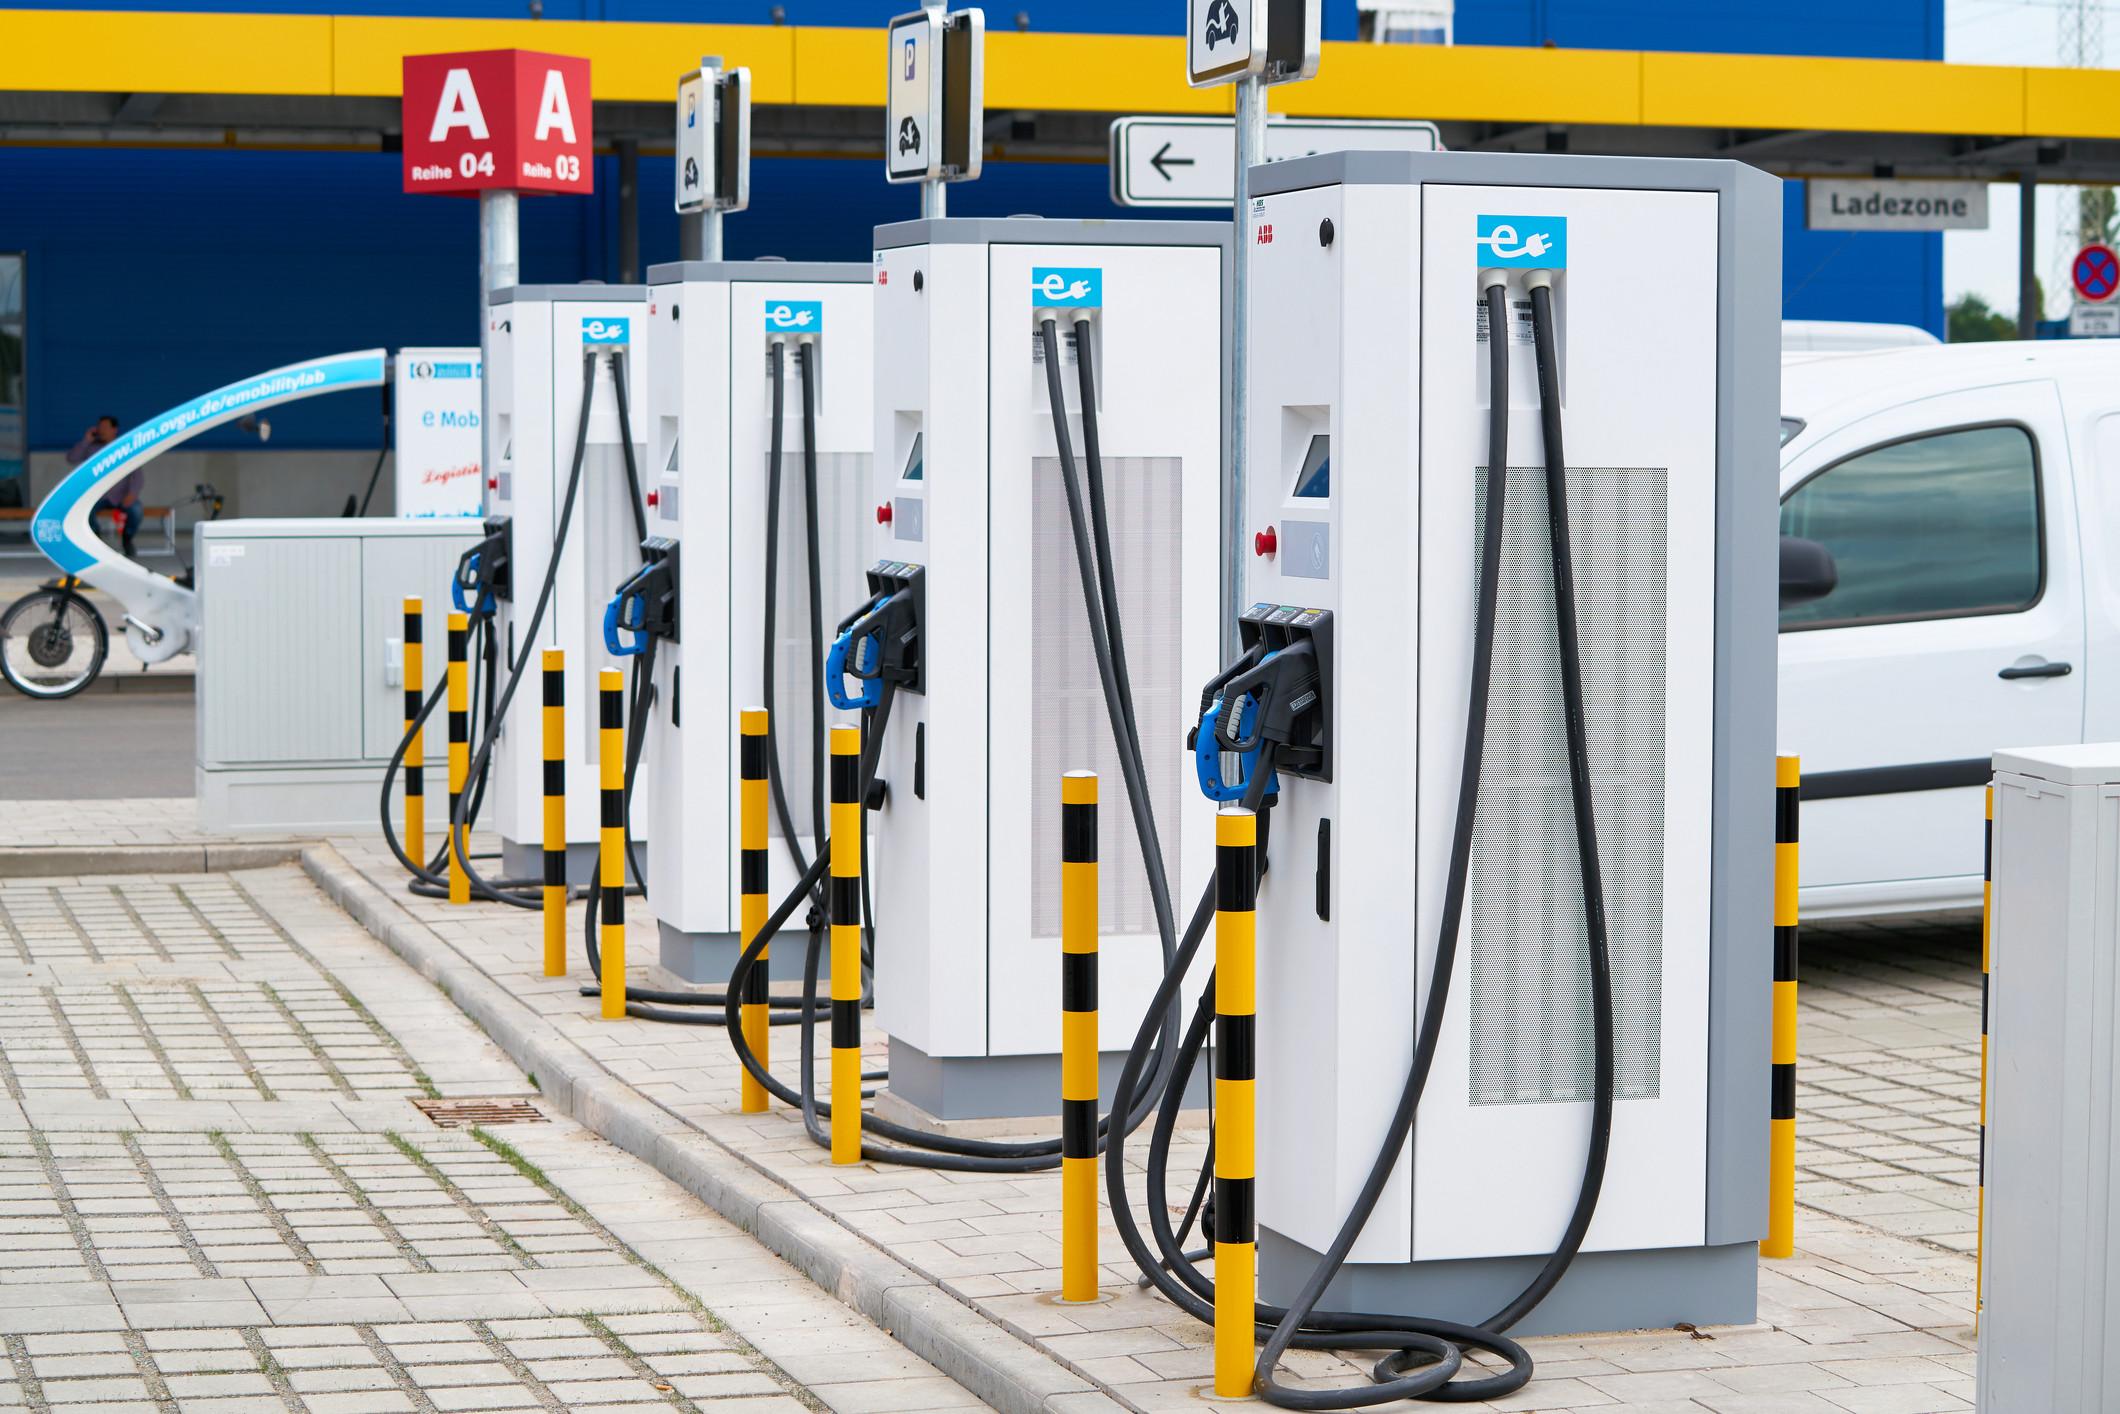 Gasolineras coche electrico